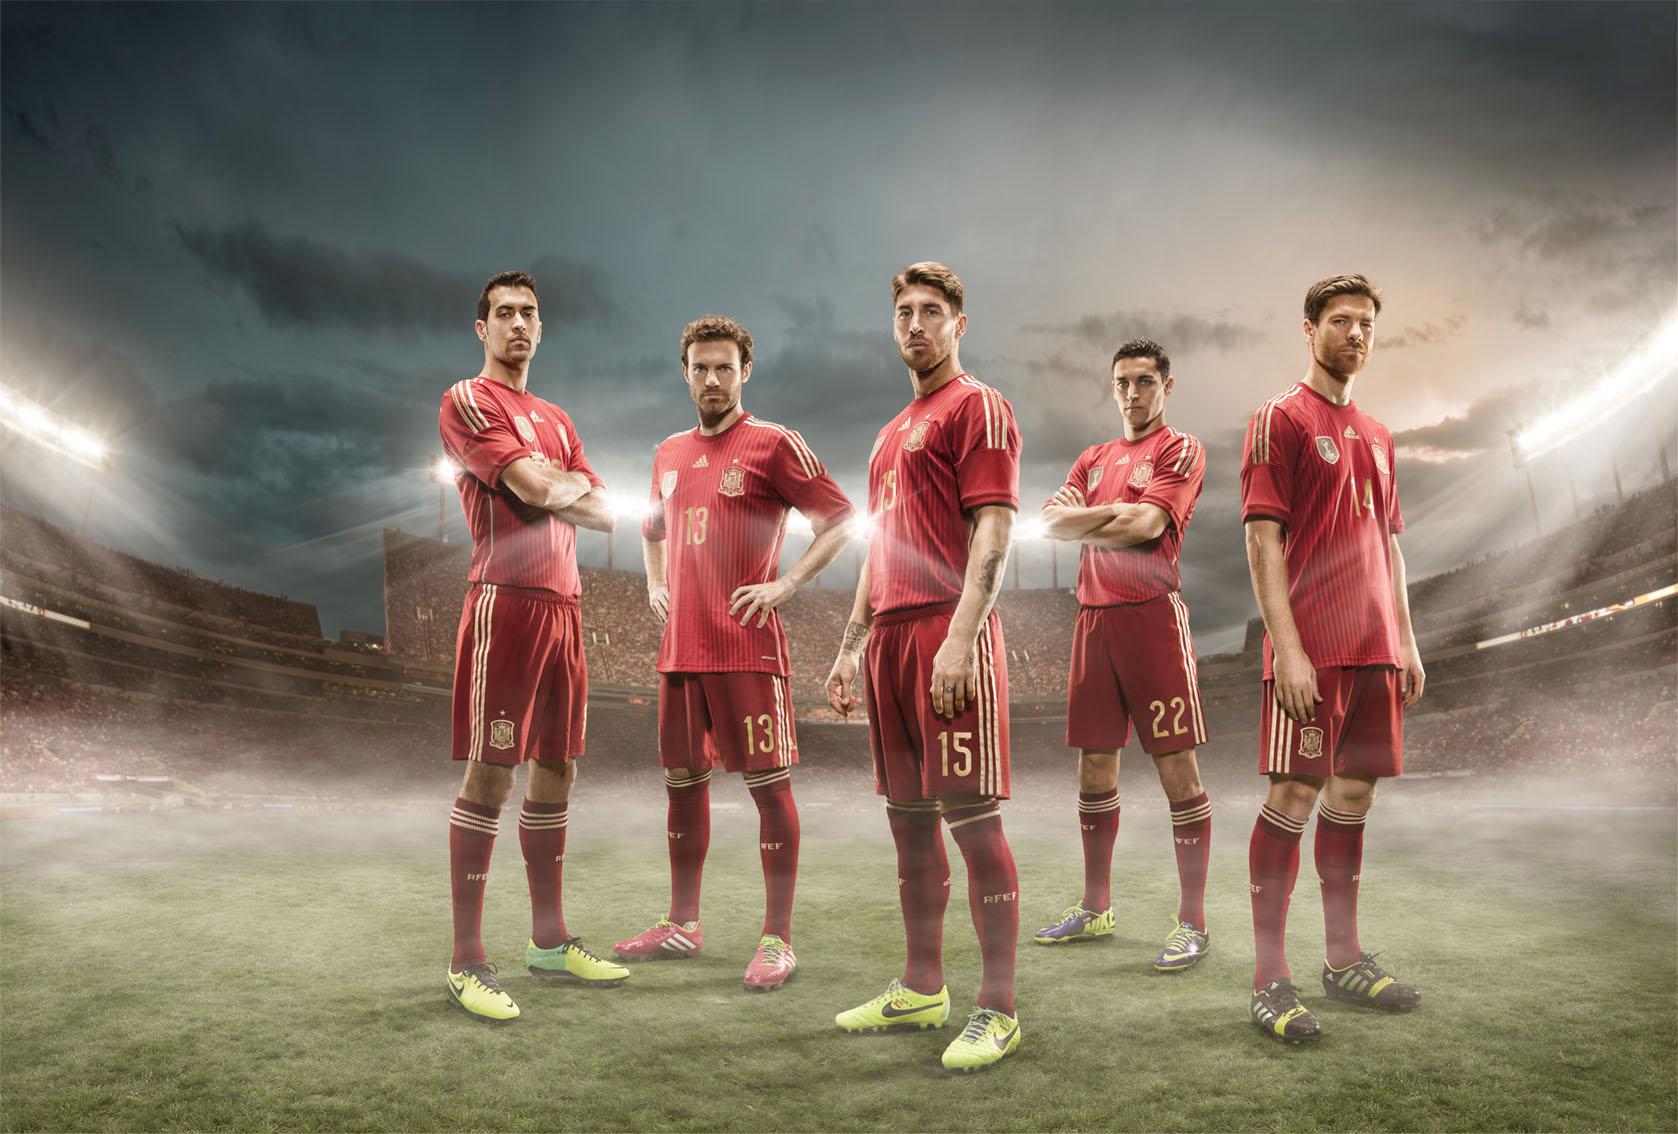 f football seleccionfutbol.jpg